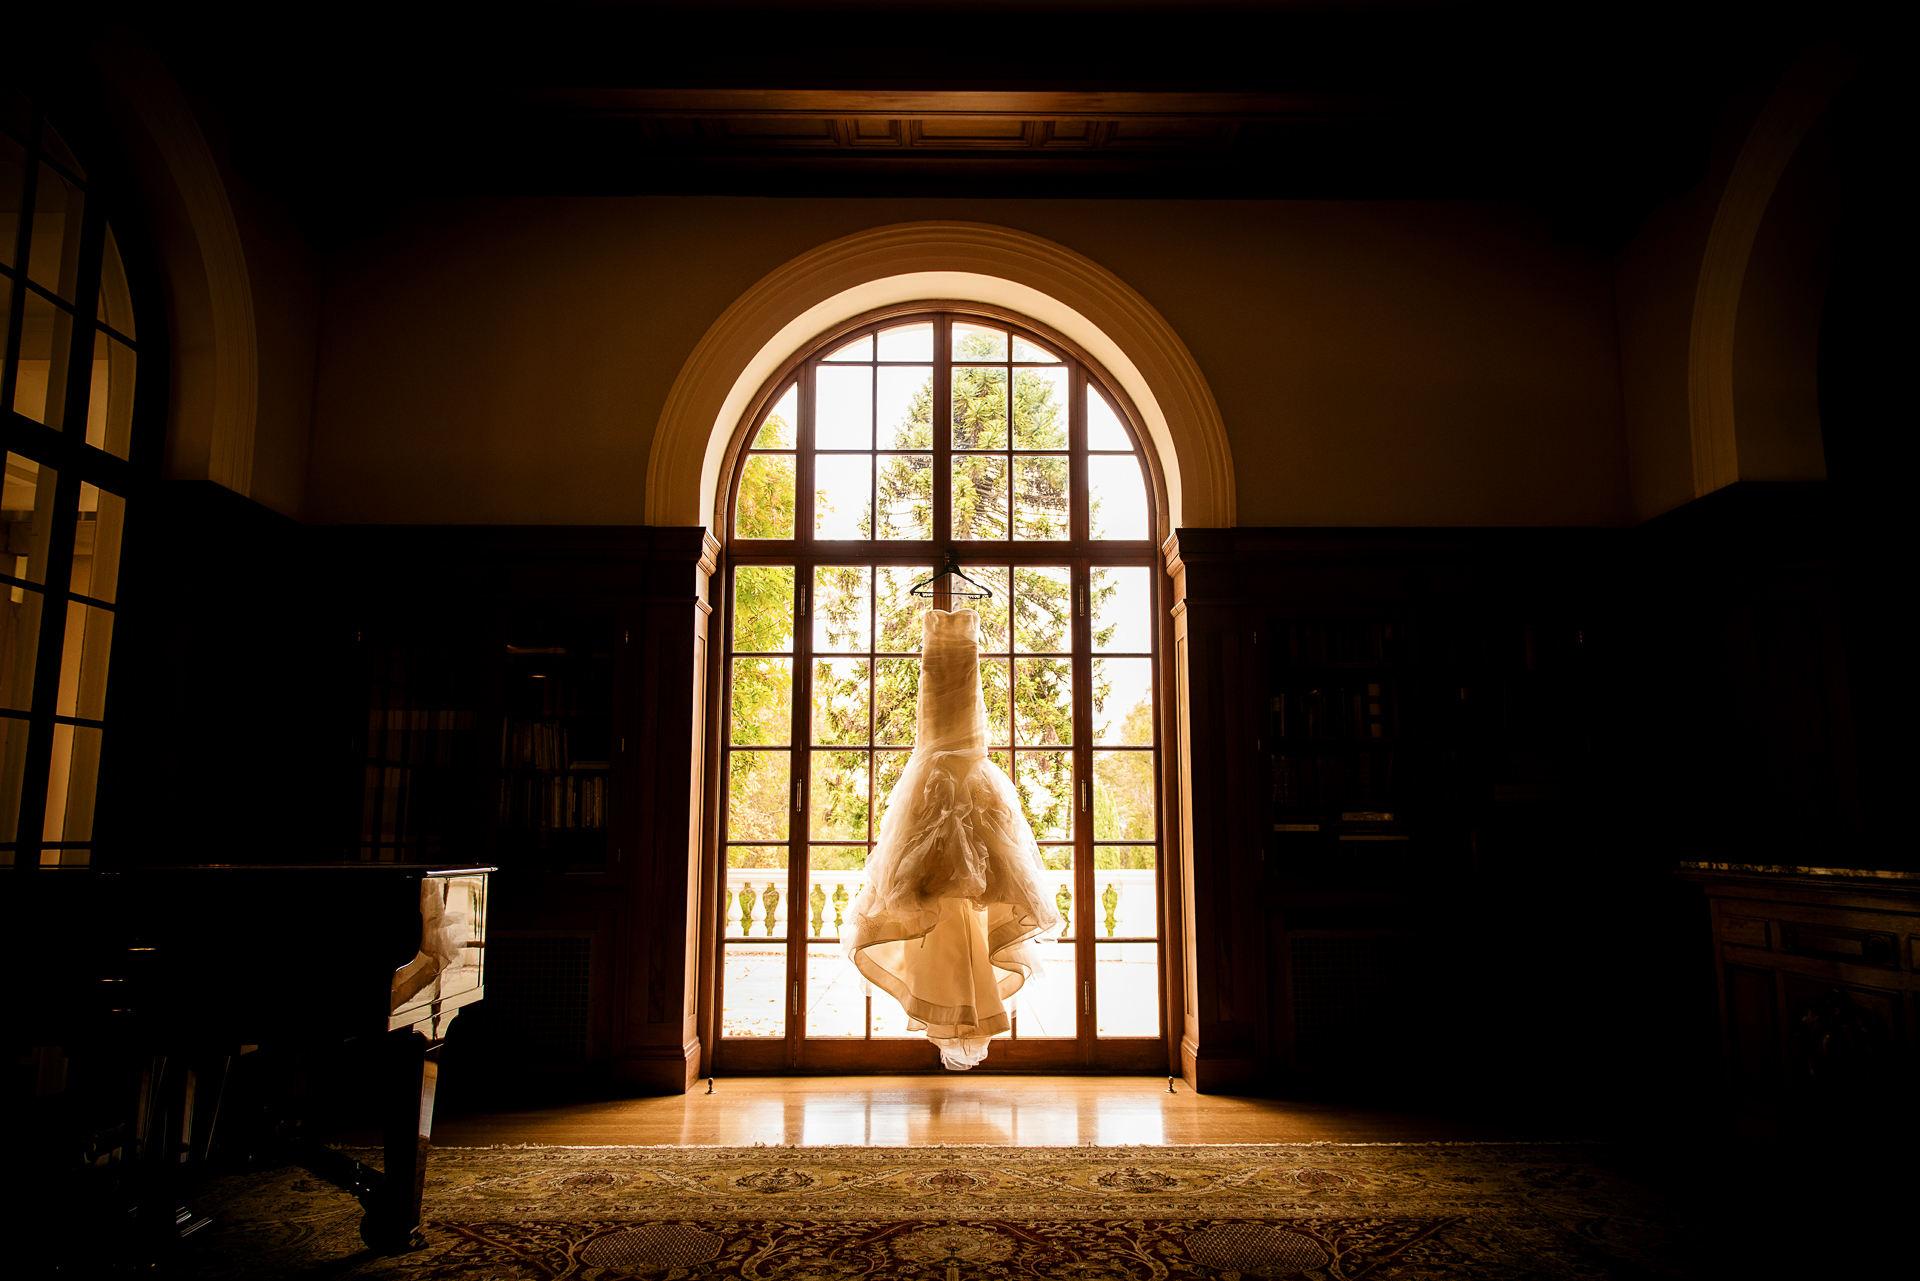 montalvo arts center wedding details